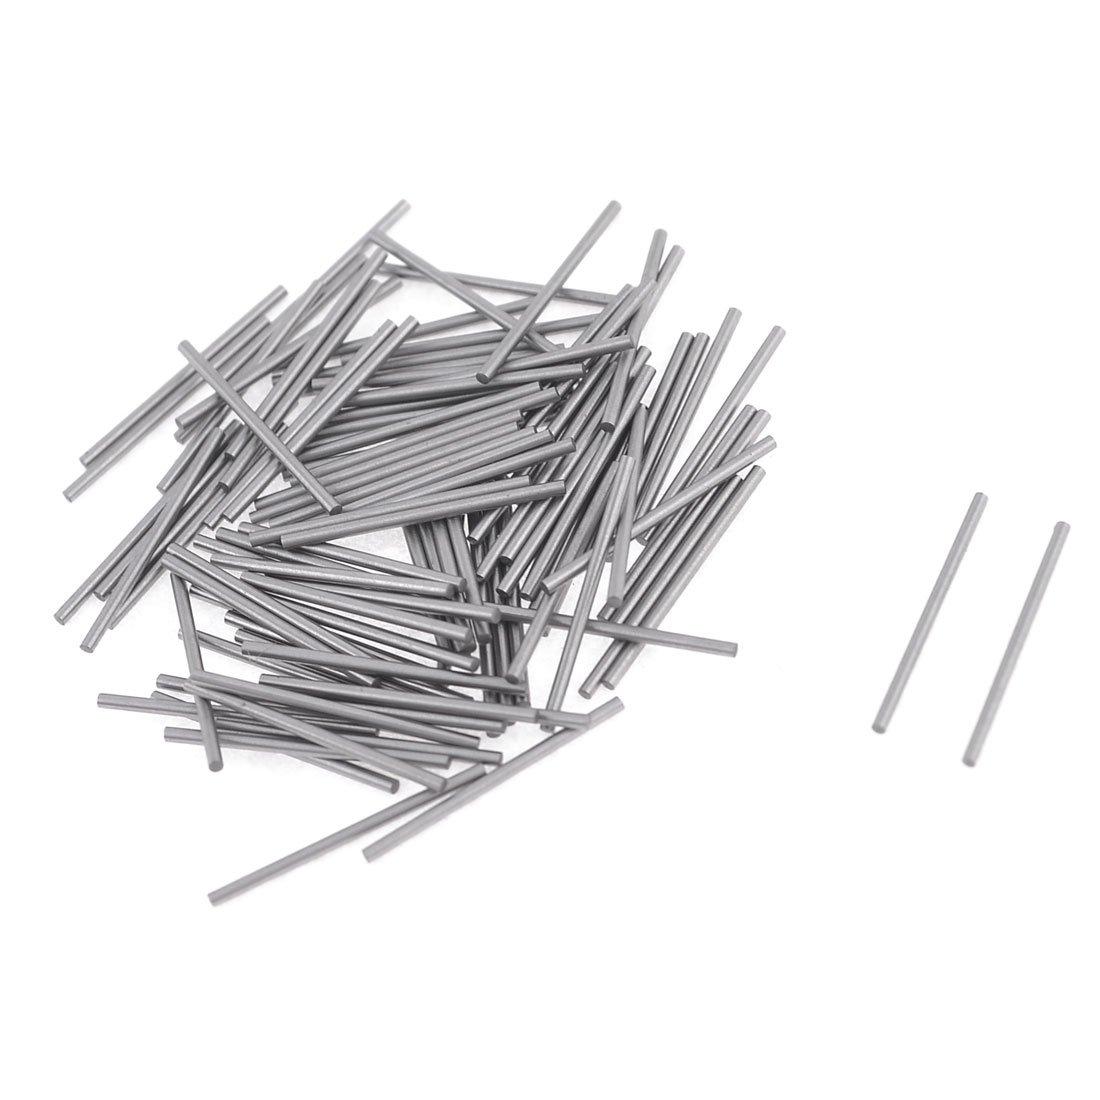 100 Pcs 0.85mm x 15.8mm Parallel Dowel Pins Fasten Elements Sourcingmap a13070200ux1208